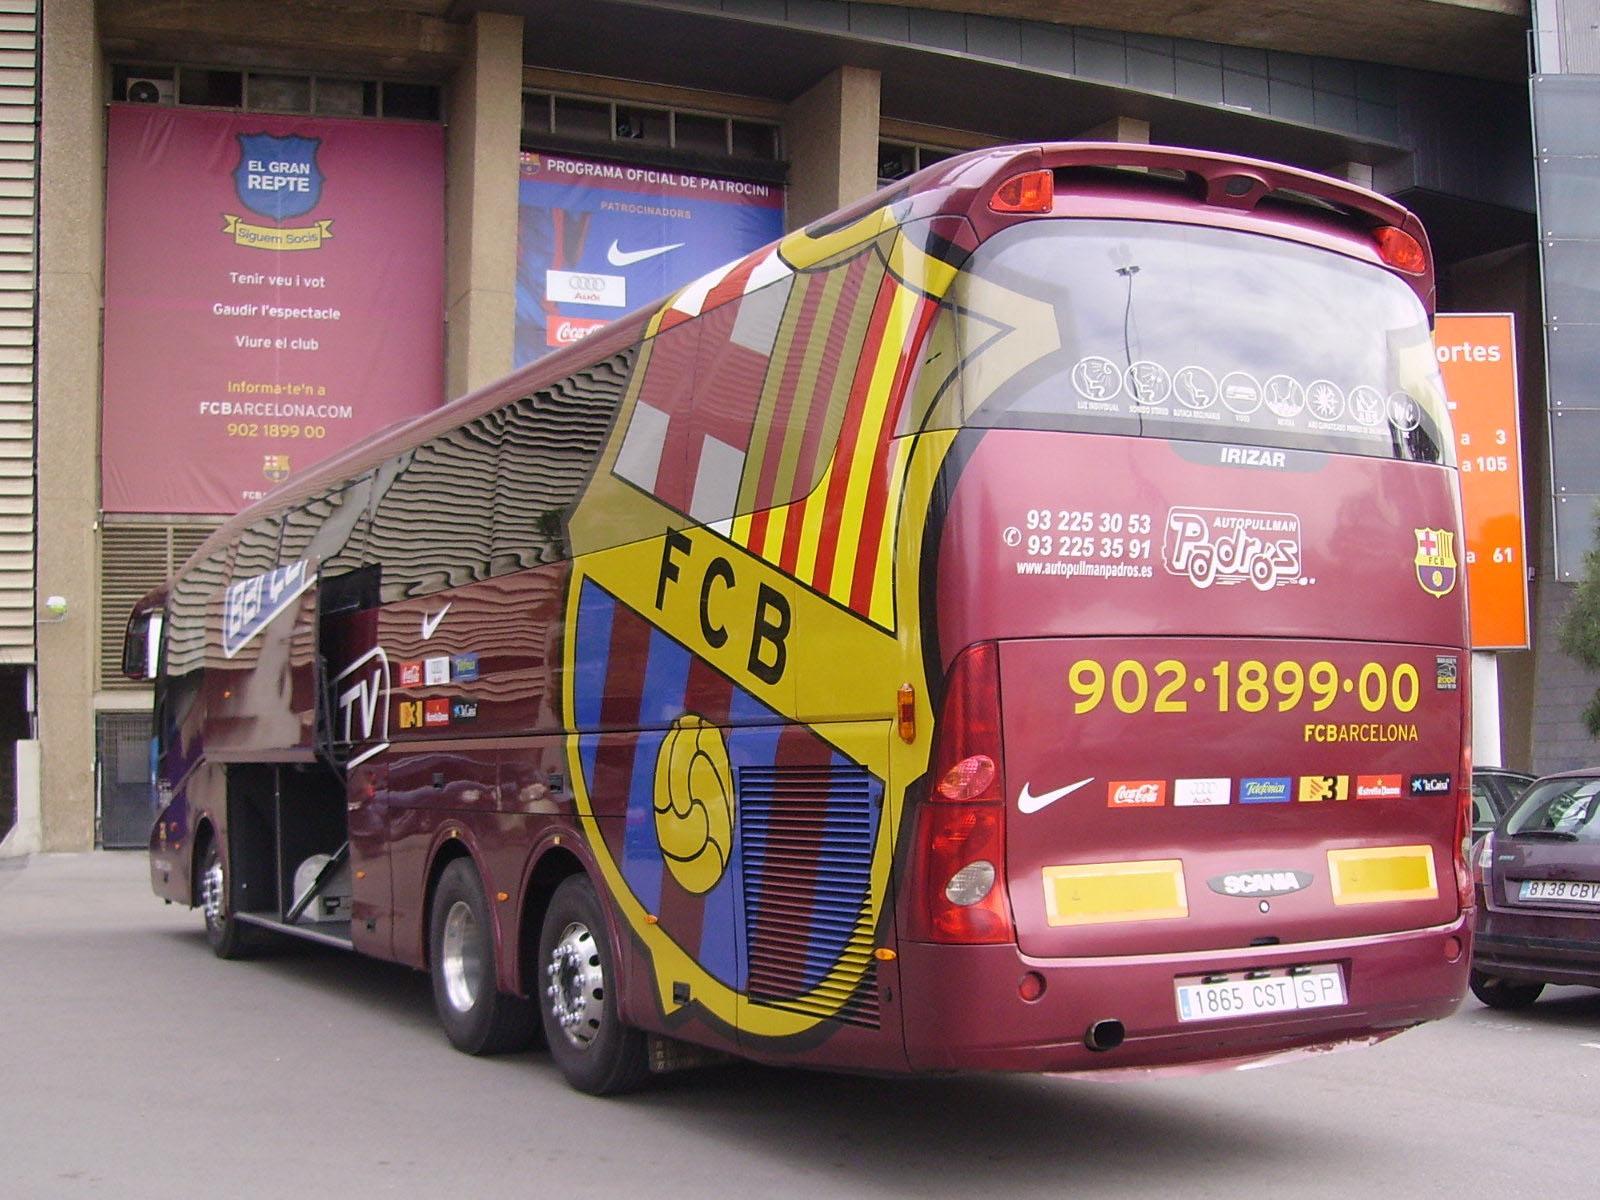 Автобус перед Камп Ноу